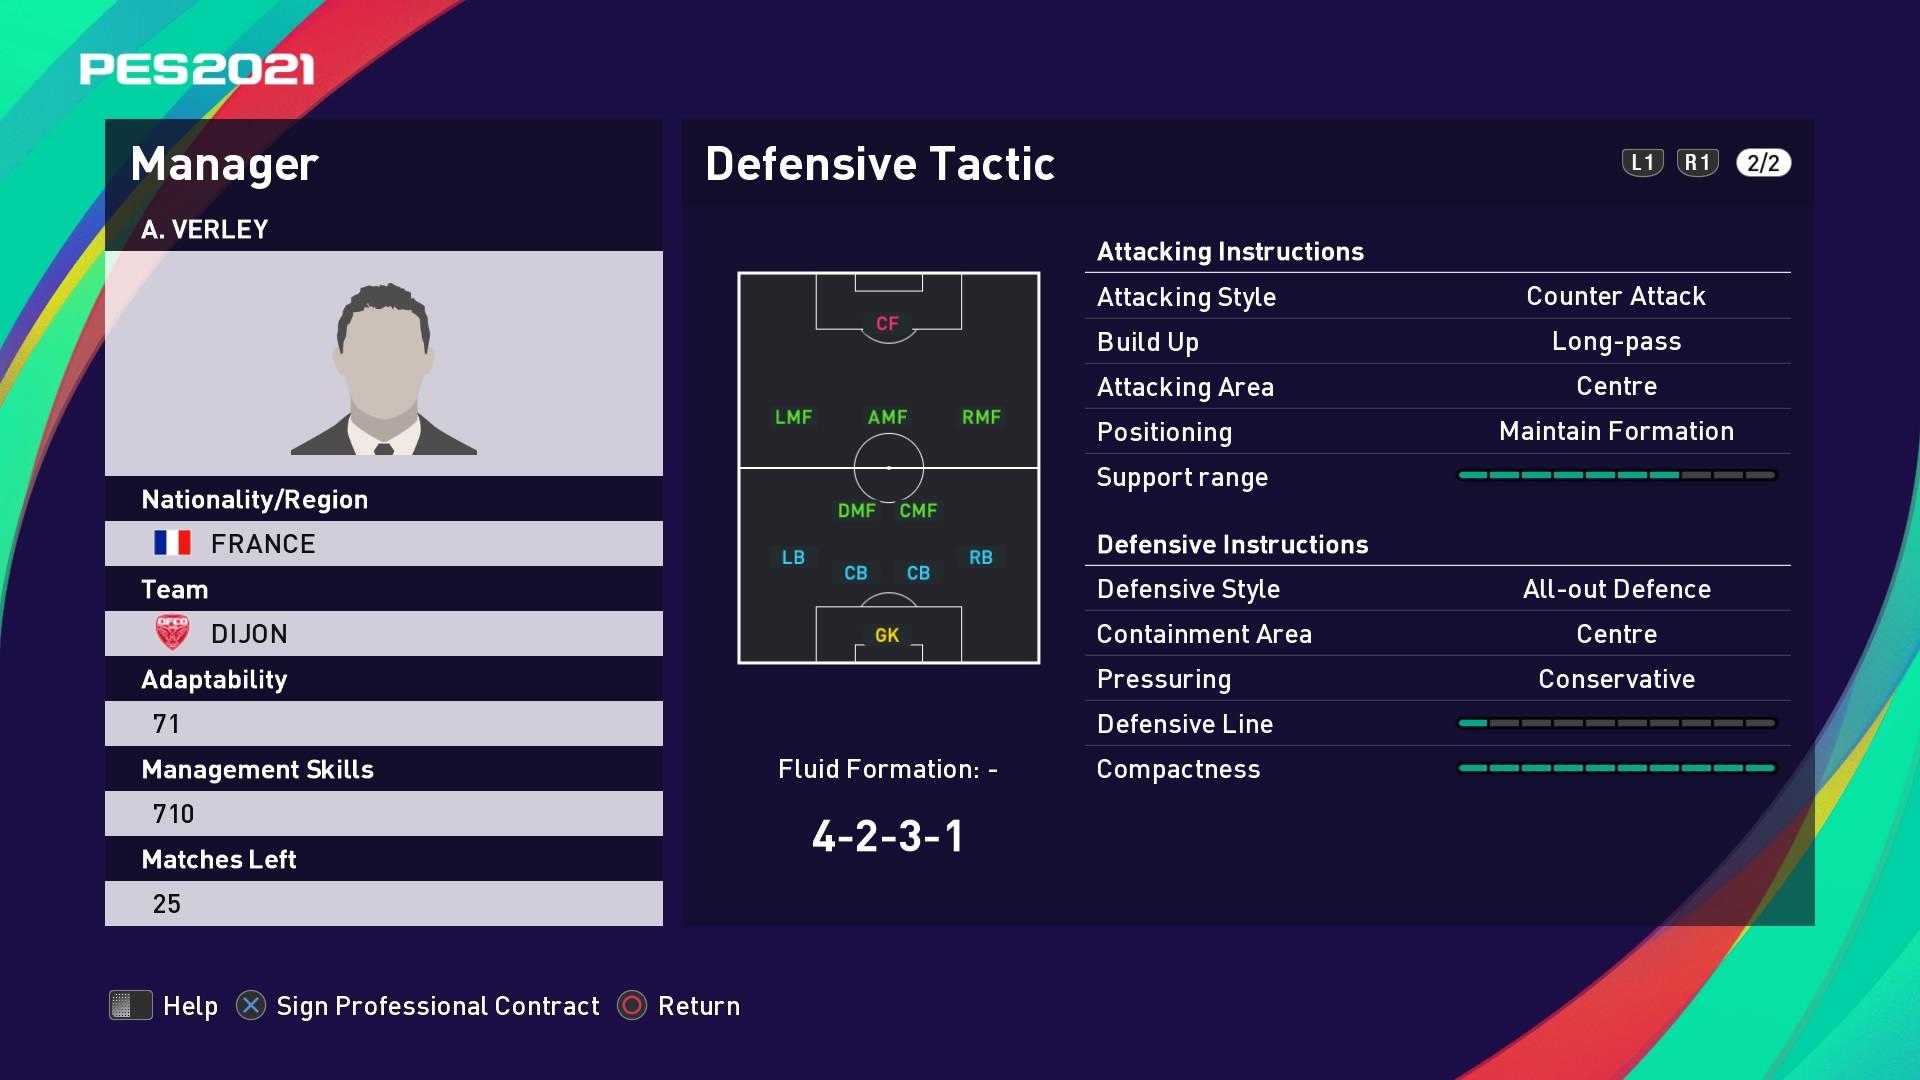 A. Verley (Stéphane Jobard) Defensive Tactic in PES 2021 myClub